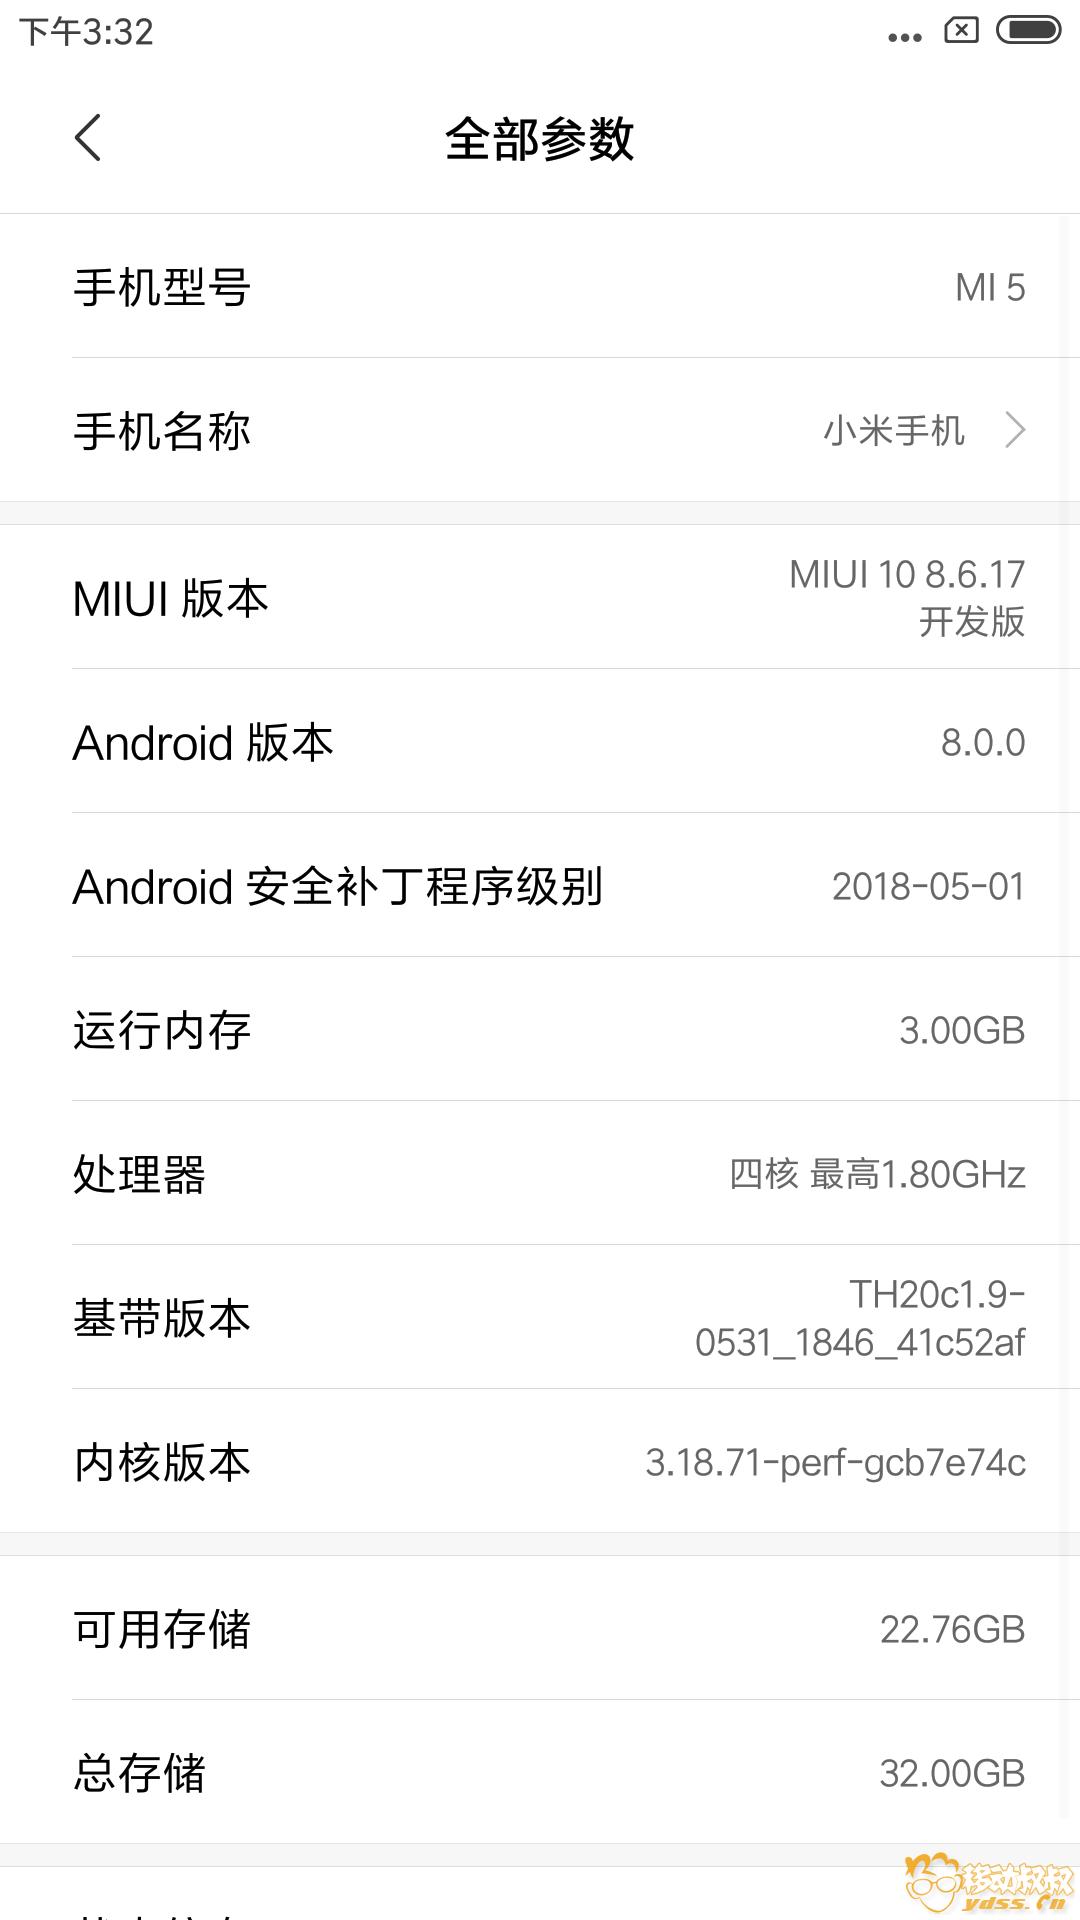 Screenshot_2018-06-17-15-32-51-292_com.android.settings.png